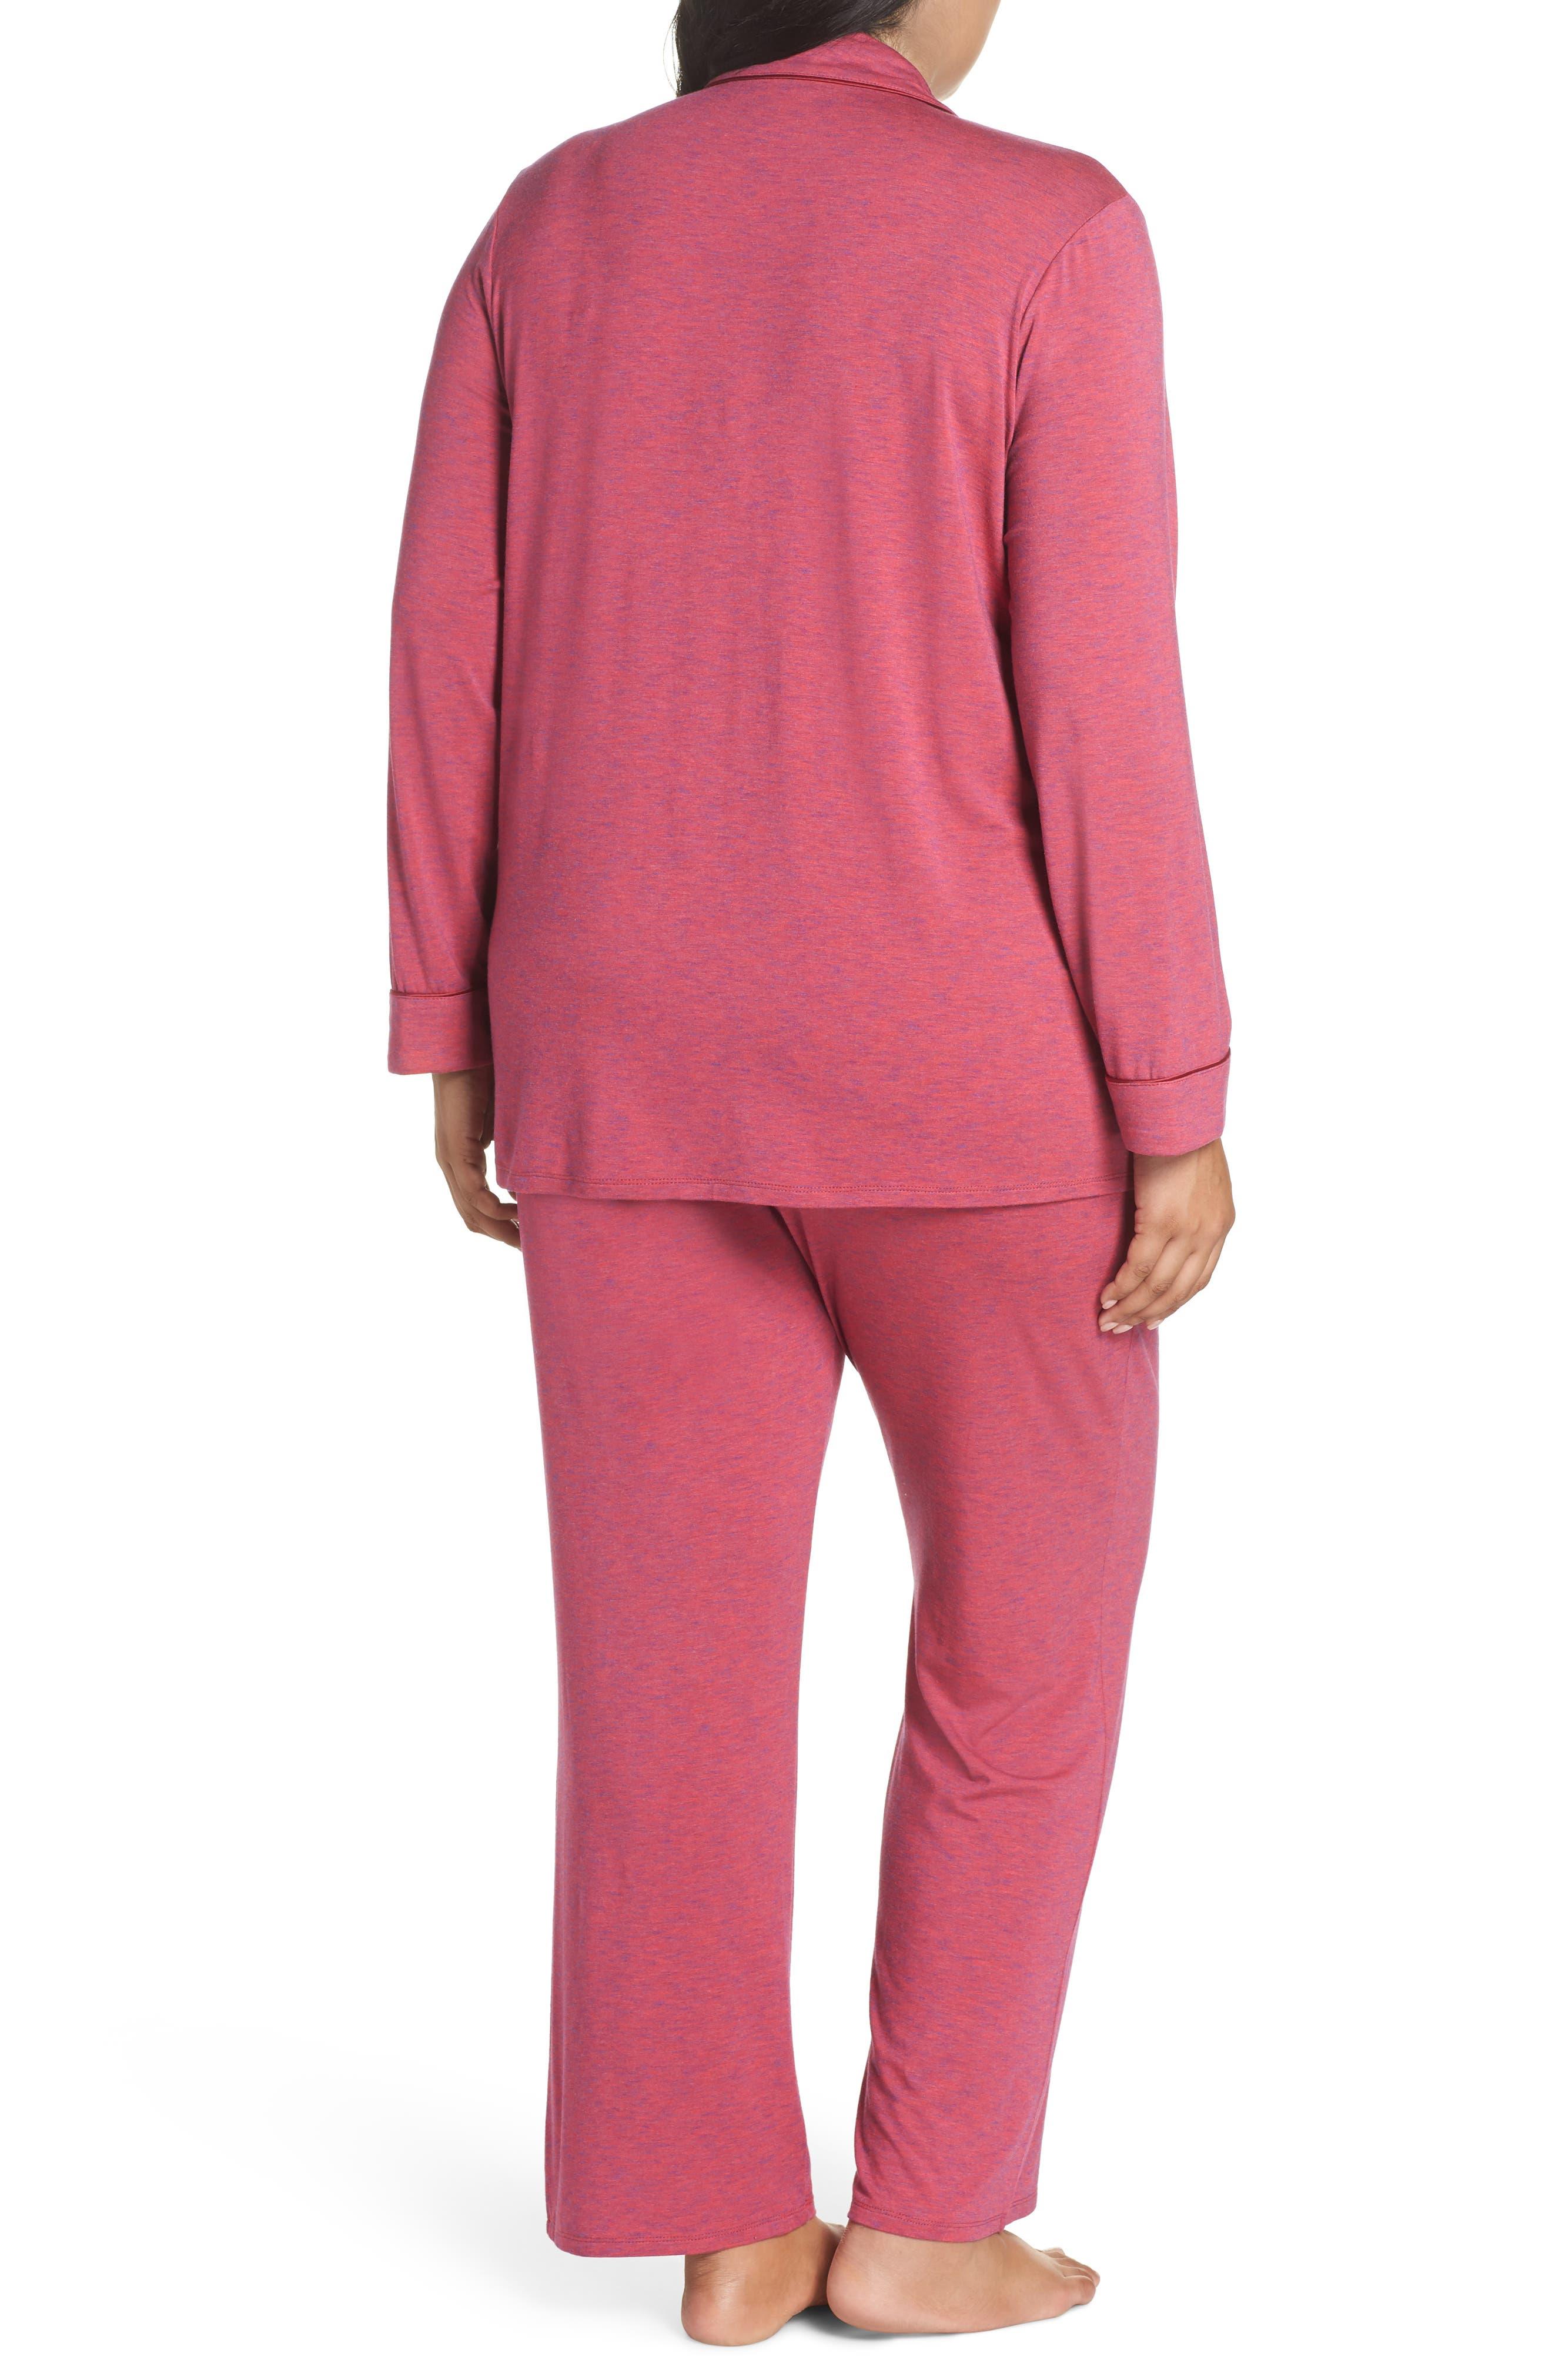 'Moonlight' Pajamas,                             Alternate thumbnail 2, color,                             BURGUNDY SPACEDYE